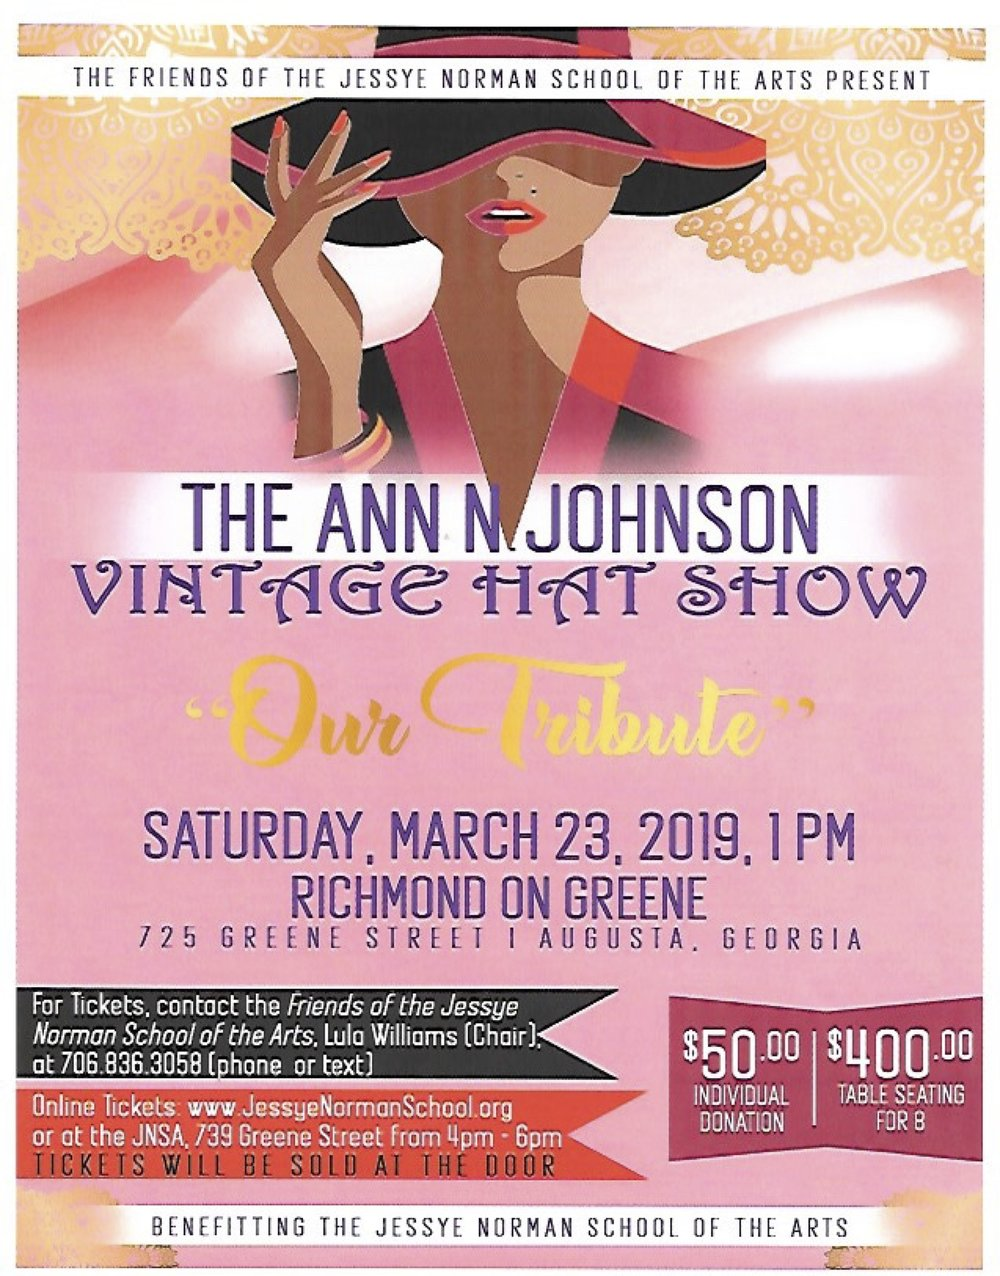 Vintage Hat Show copy.jpg